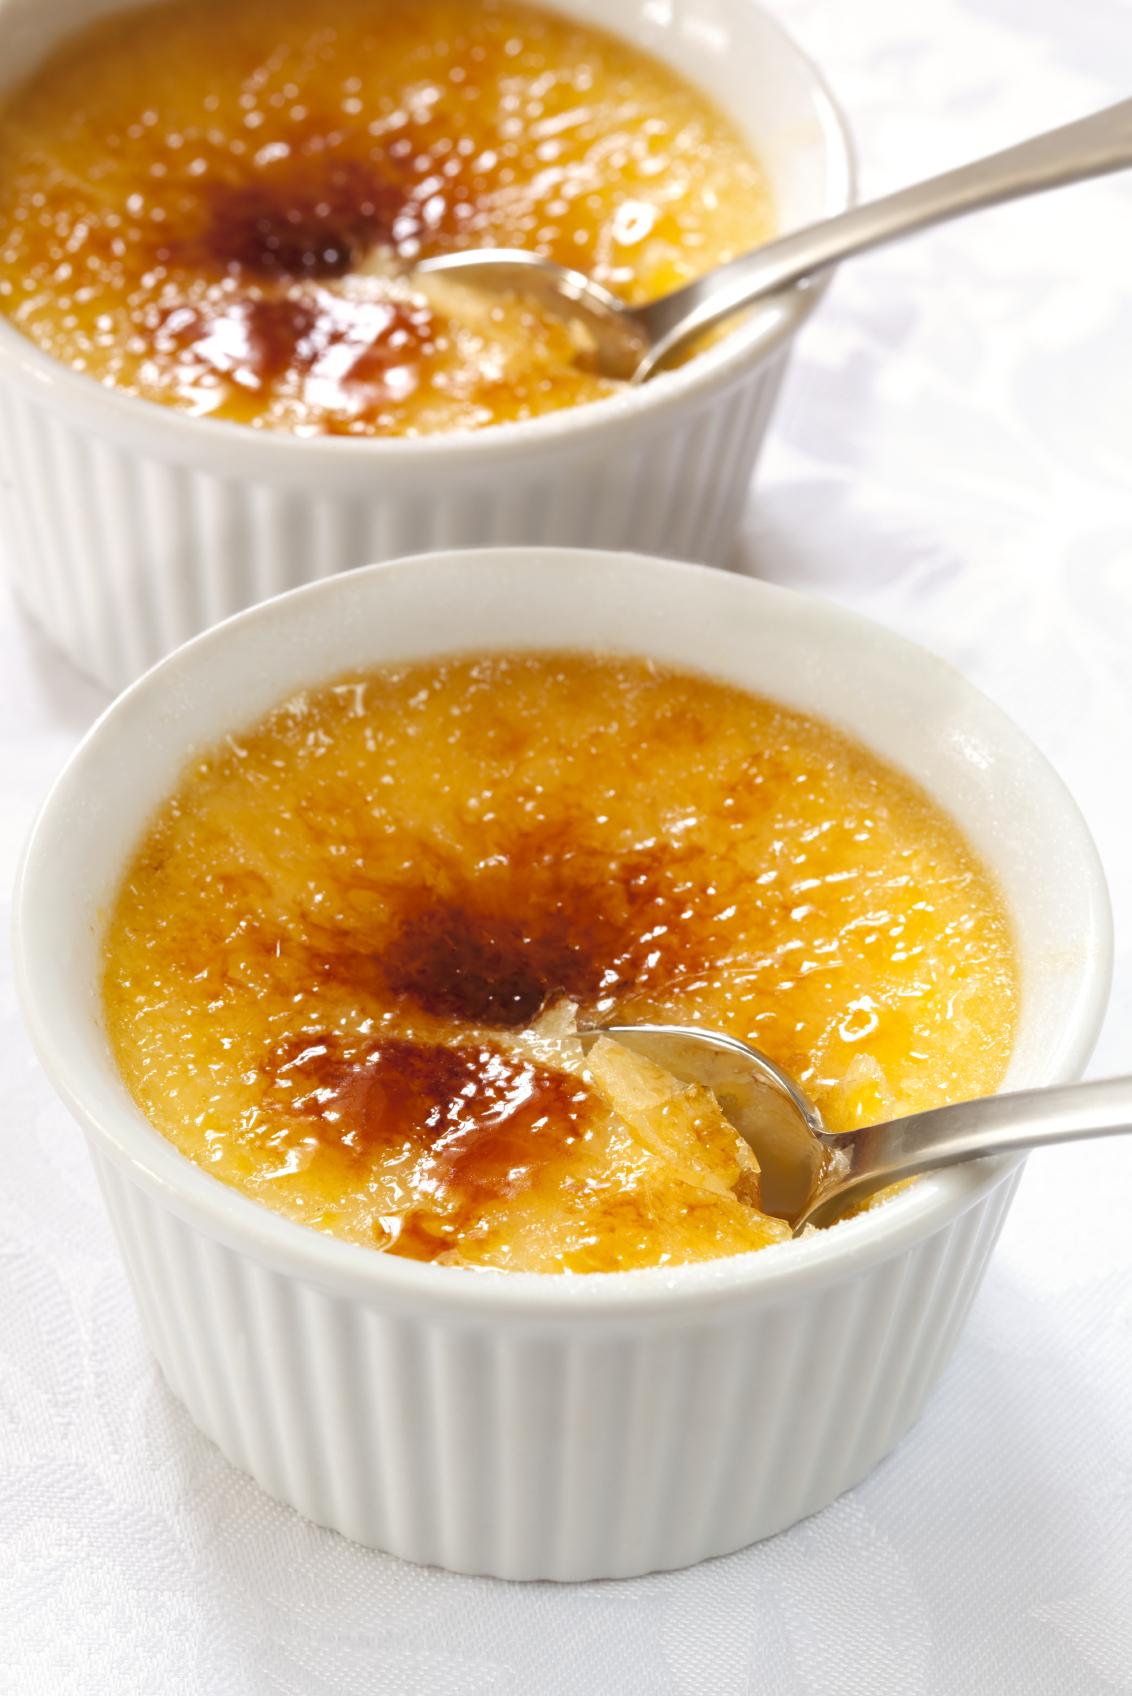 Recipe: Foolproof Crème Brûlée